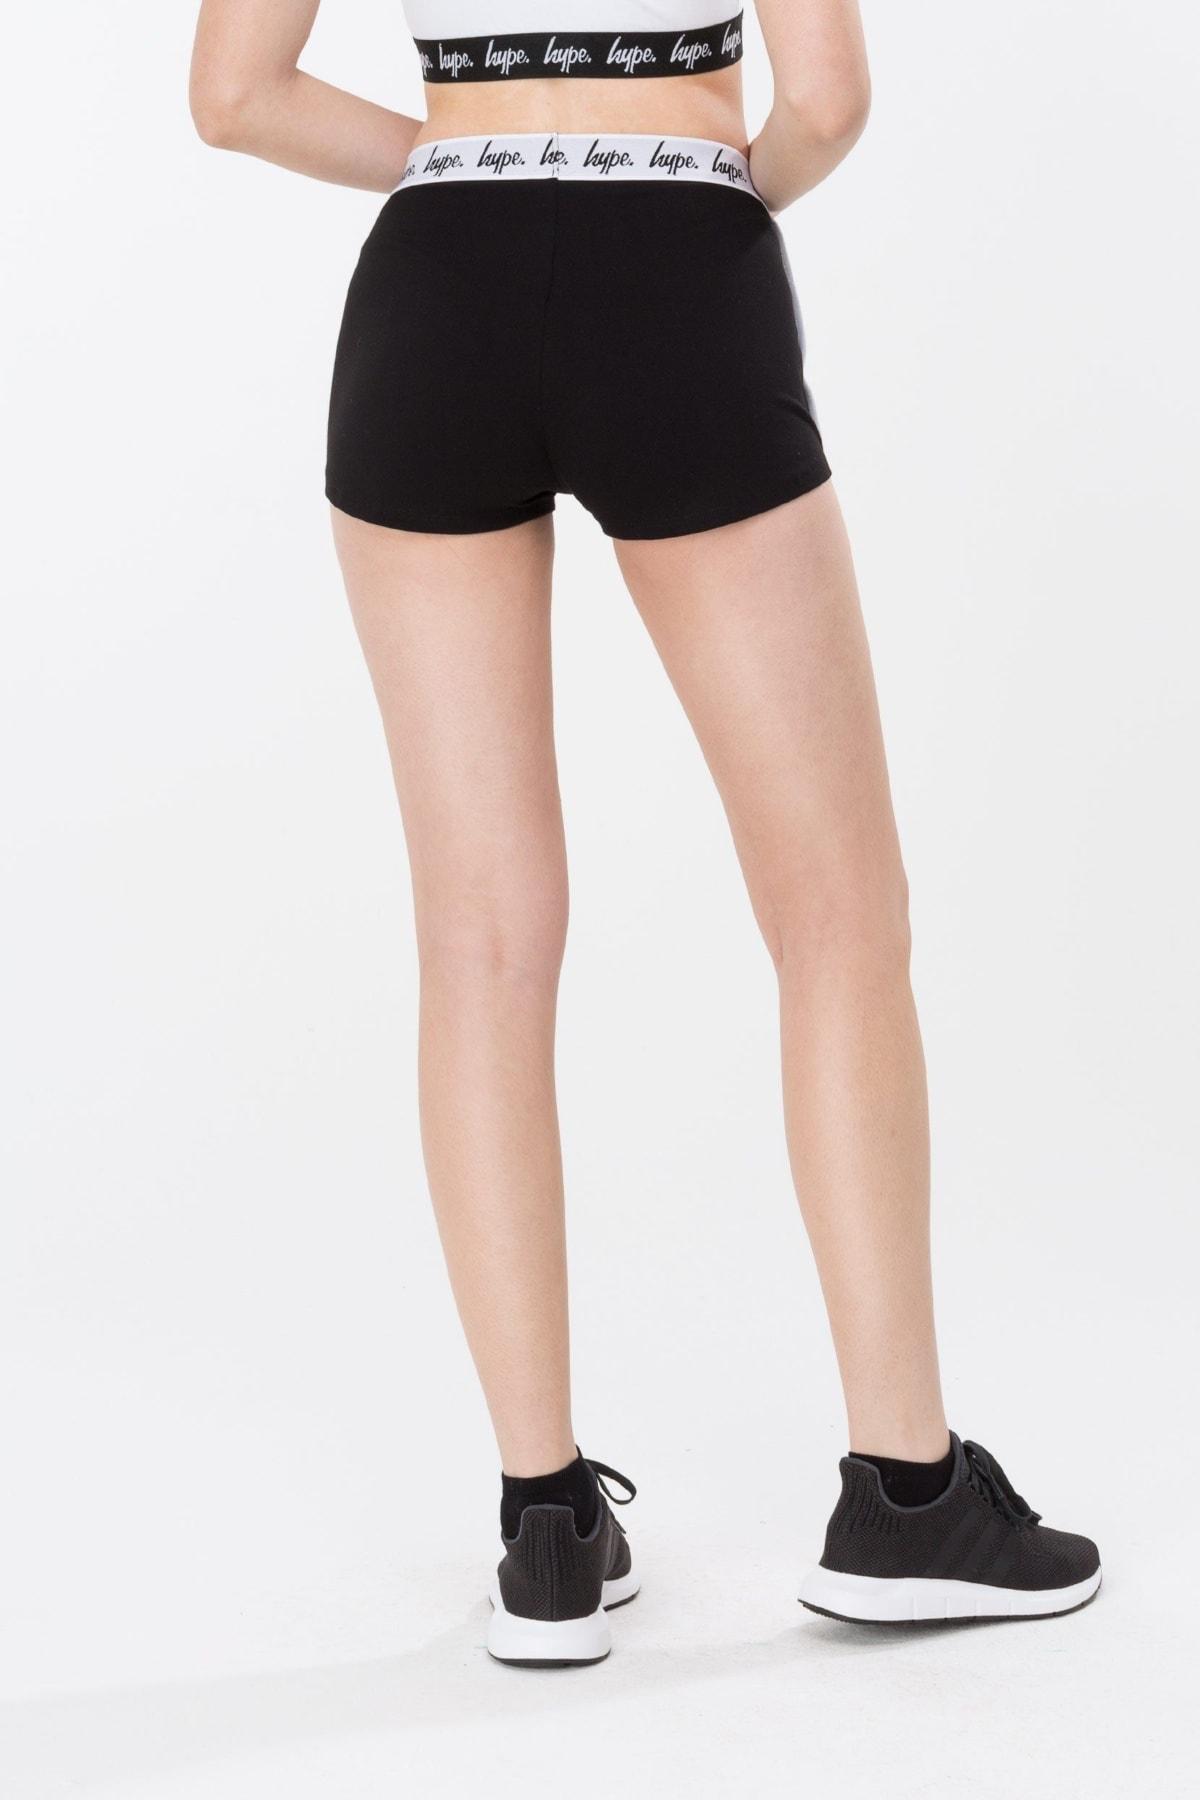 HYPE Black/White Mono Running Women's Shorts